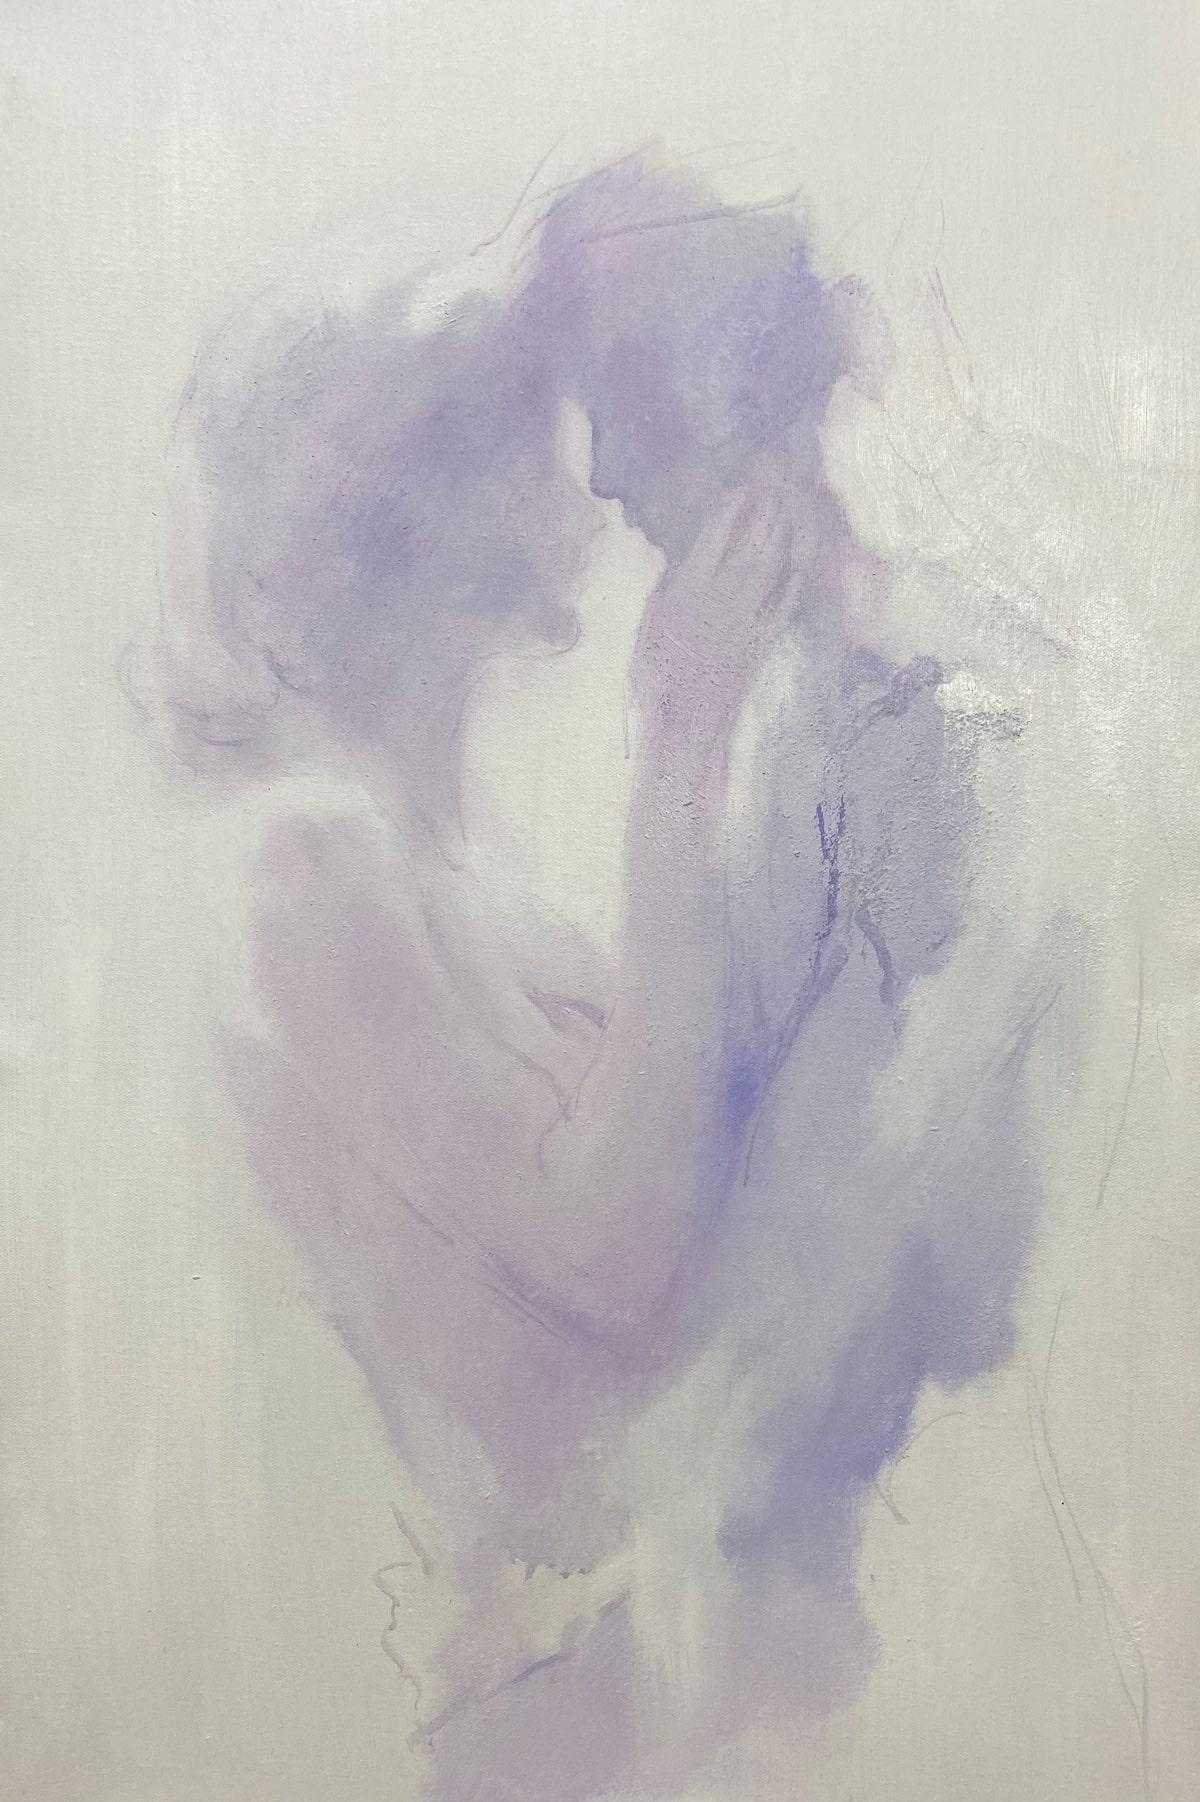 paintru-ghost-human-form-abstract-portrait-min